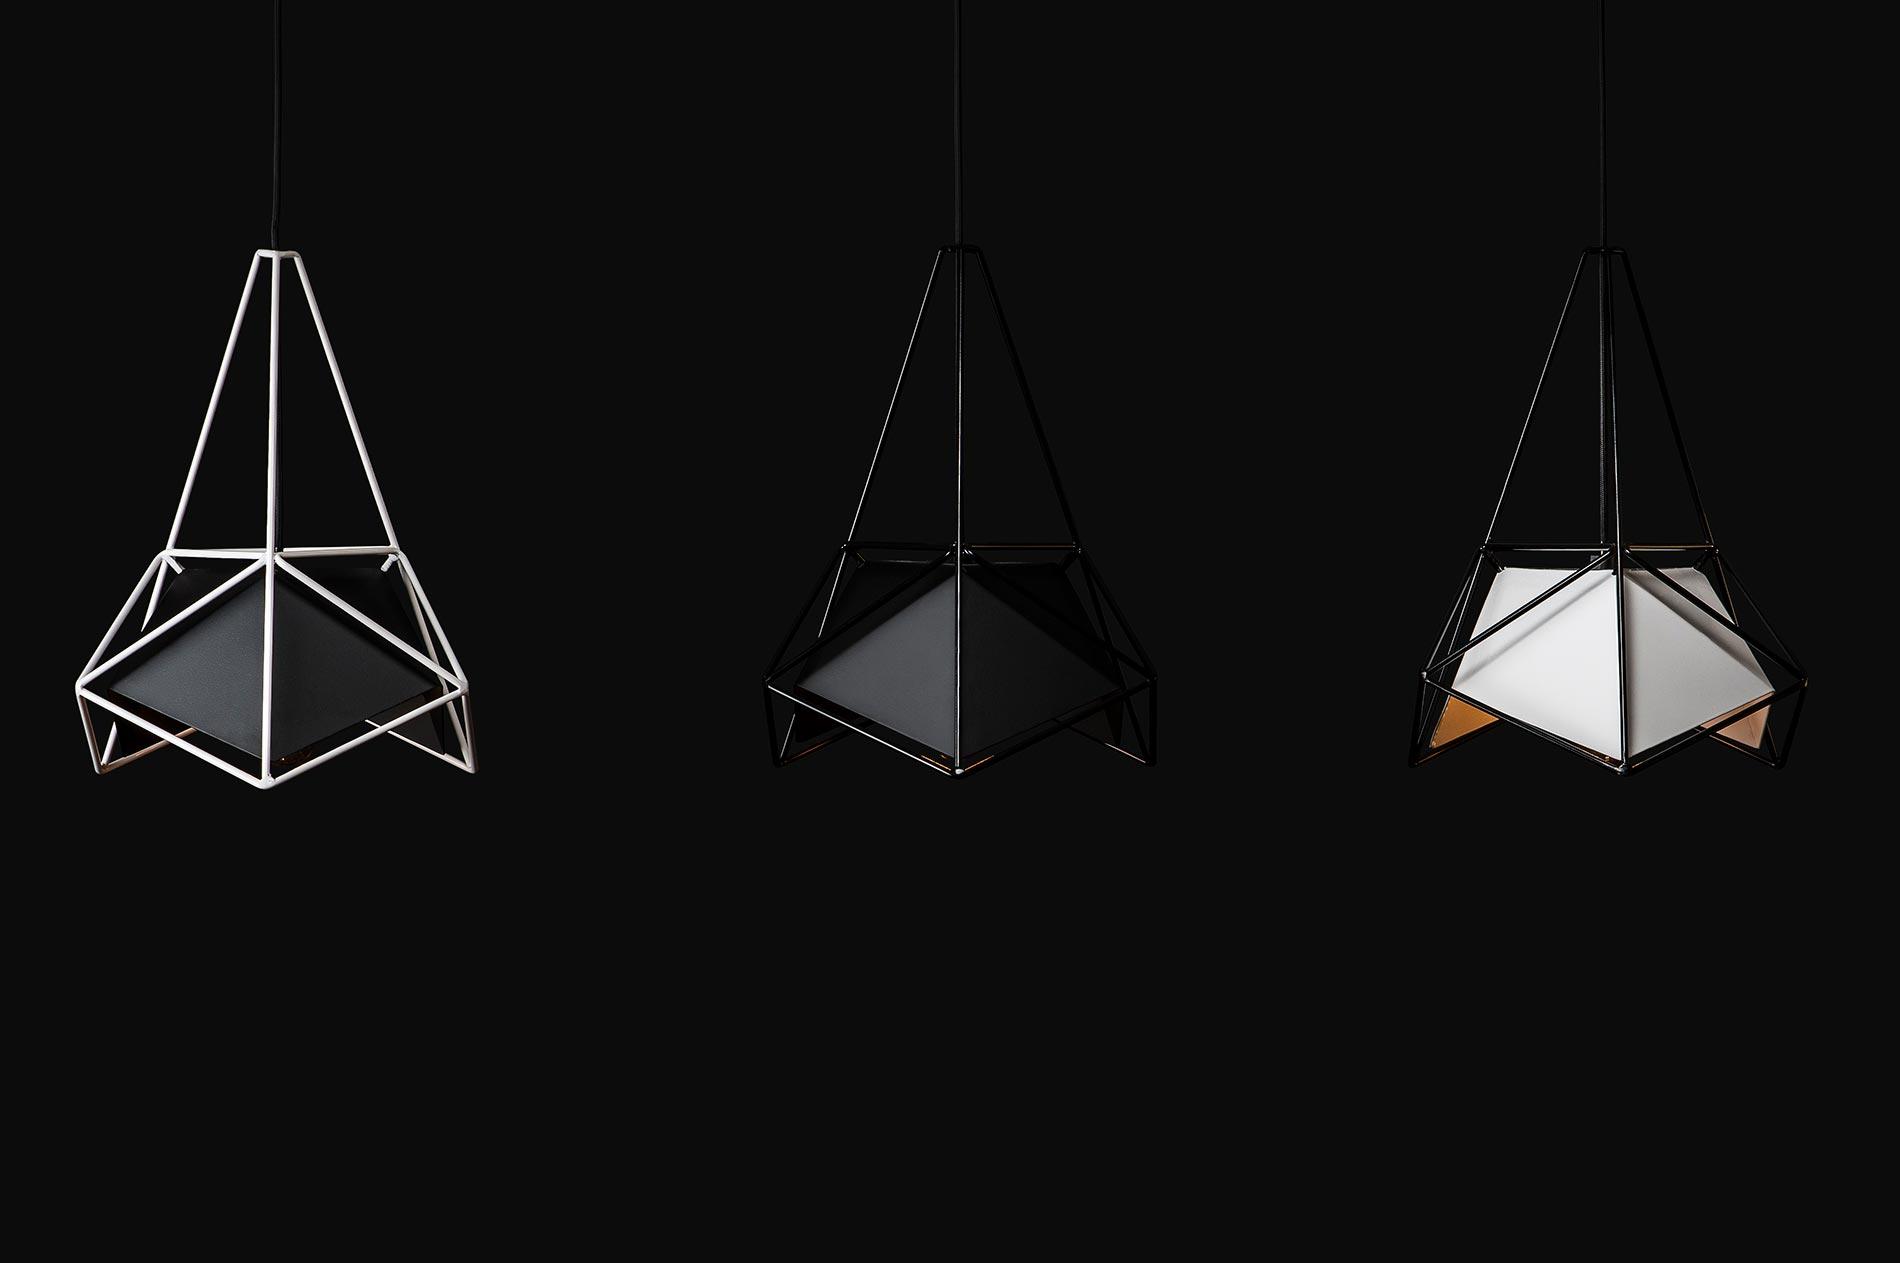 U32-1 Pendant Lamps by SHIFT for Lampslite